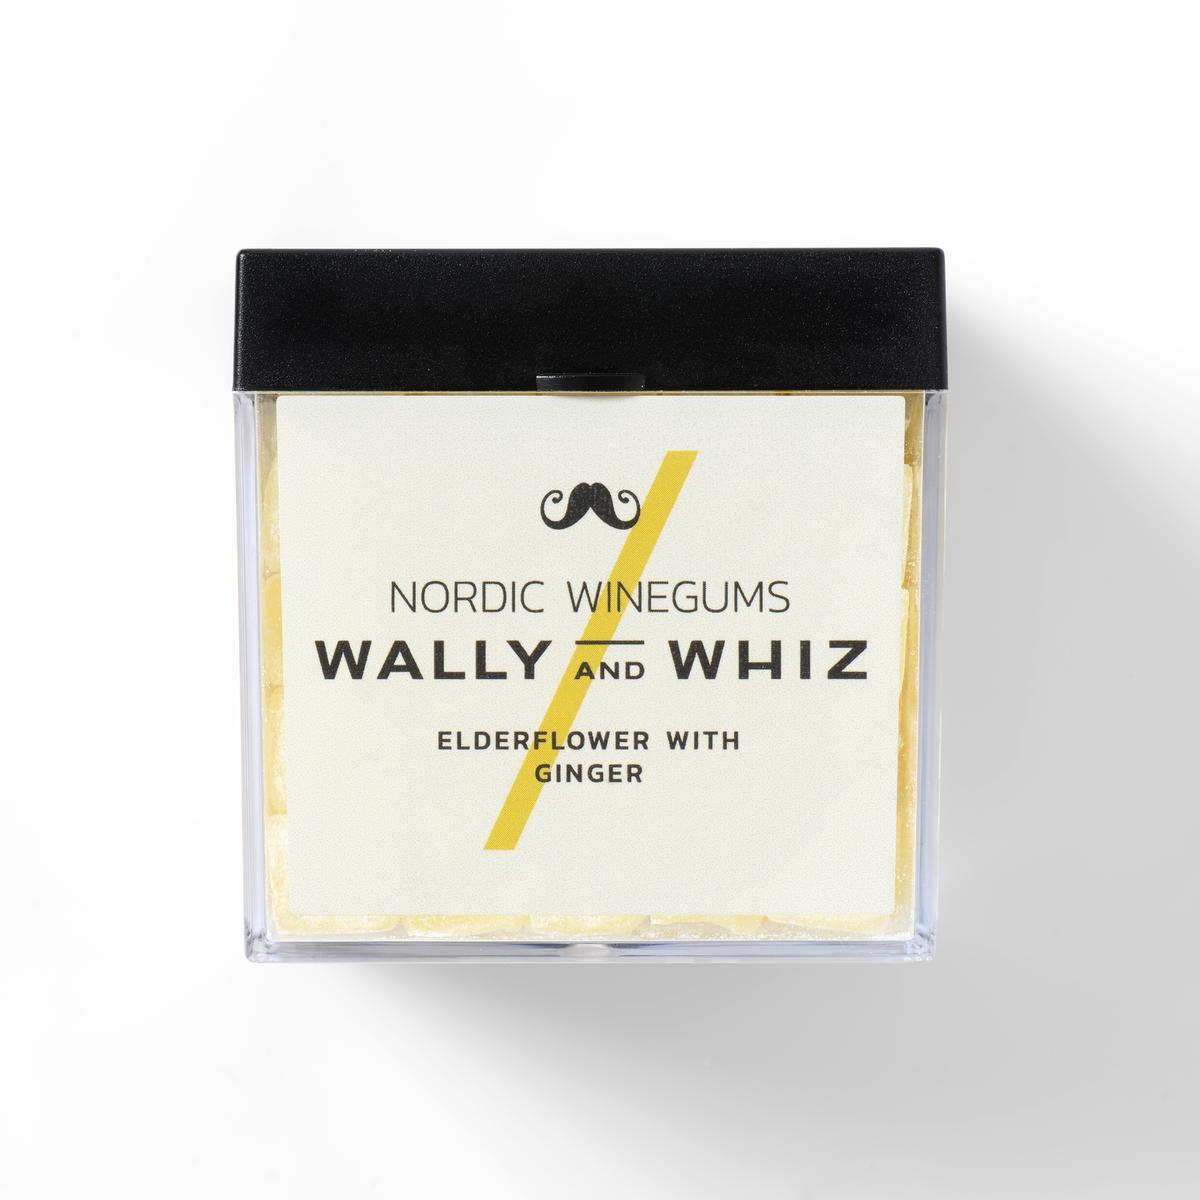 Wally and Whiz - Elderflower w. Ginger